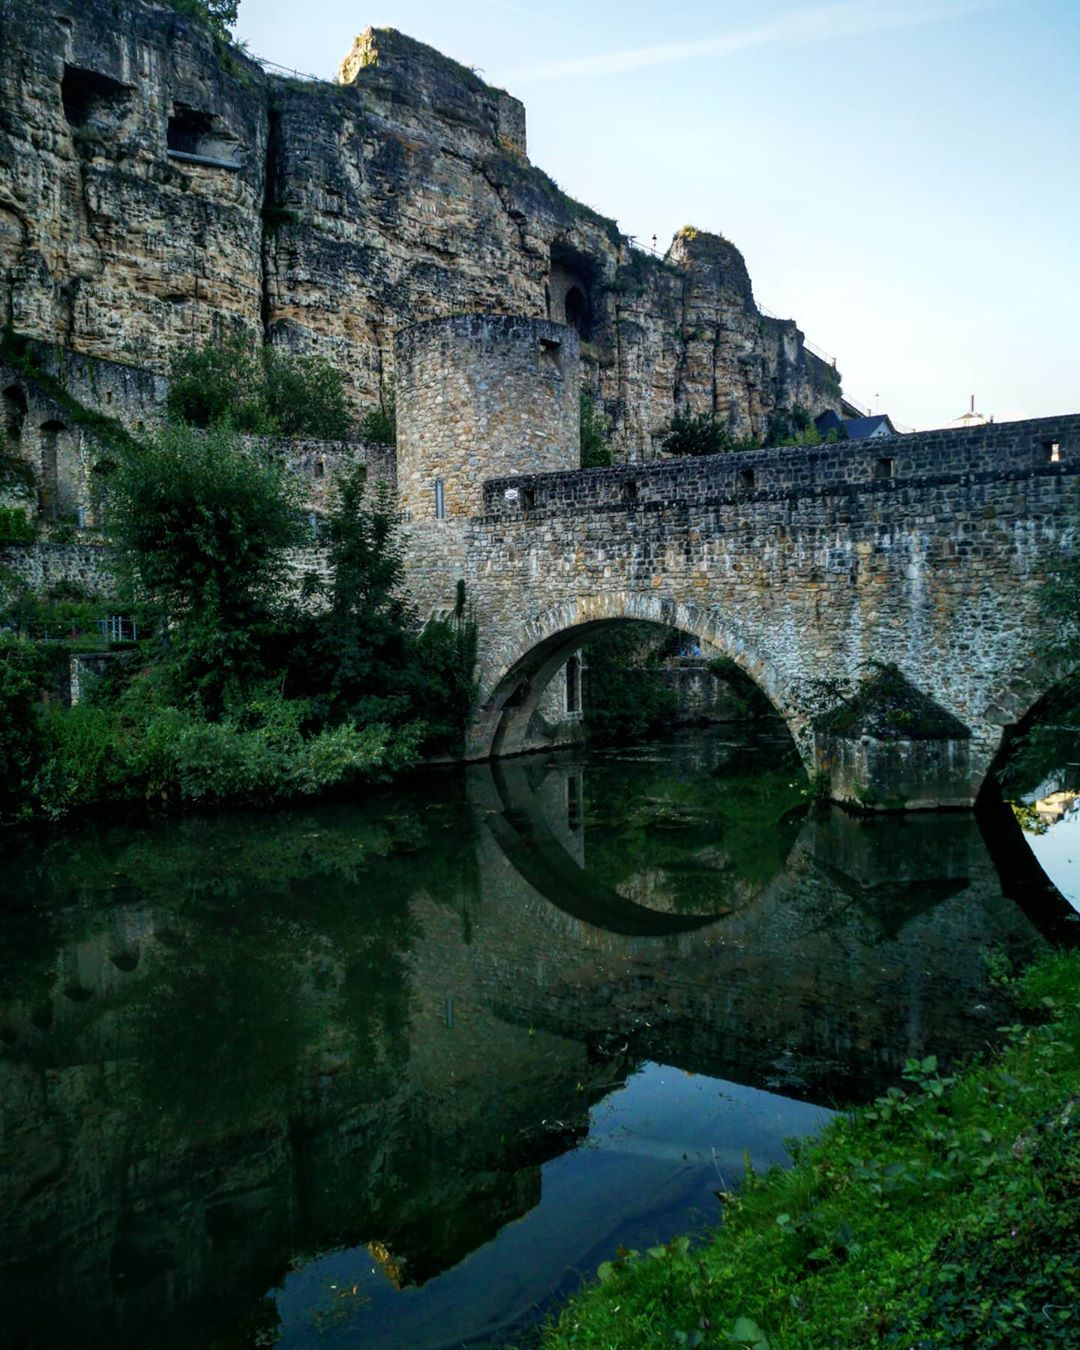 #luxembourg #travelphotography #travelgram #travelblogger #architecture #view #beautifulcity #reflection